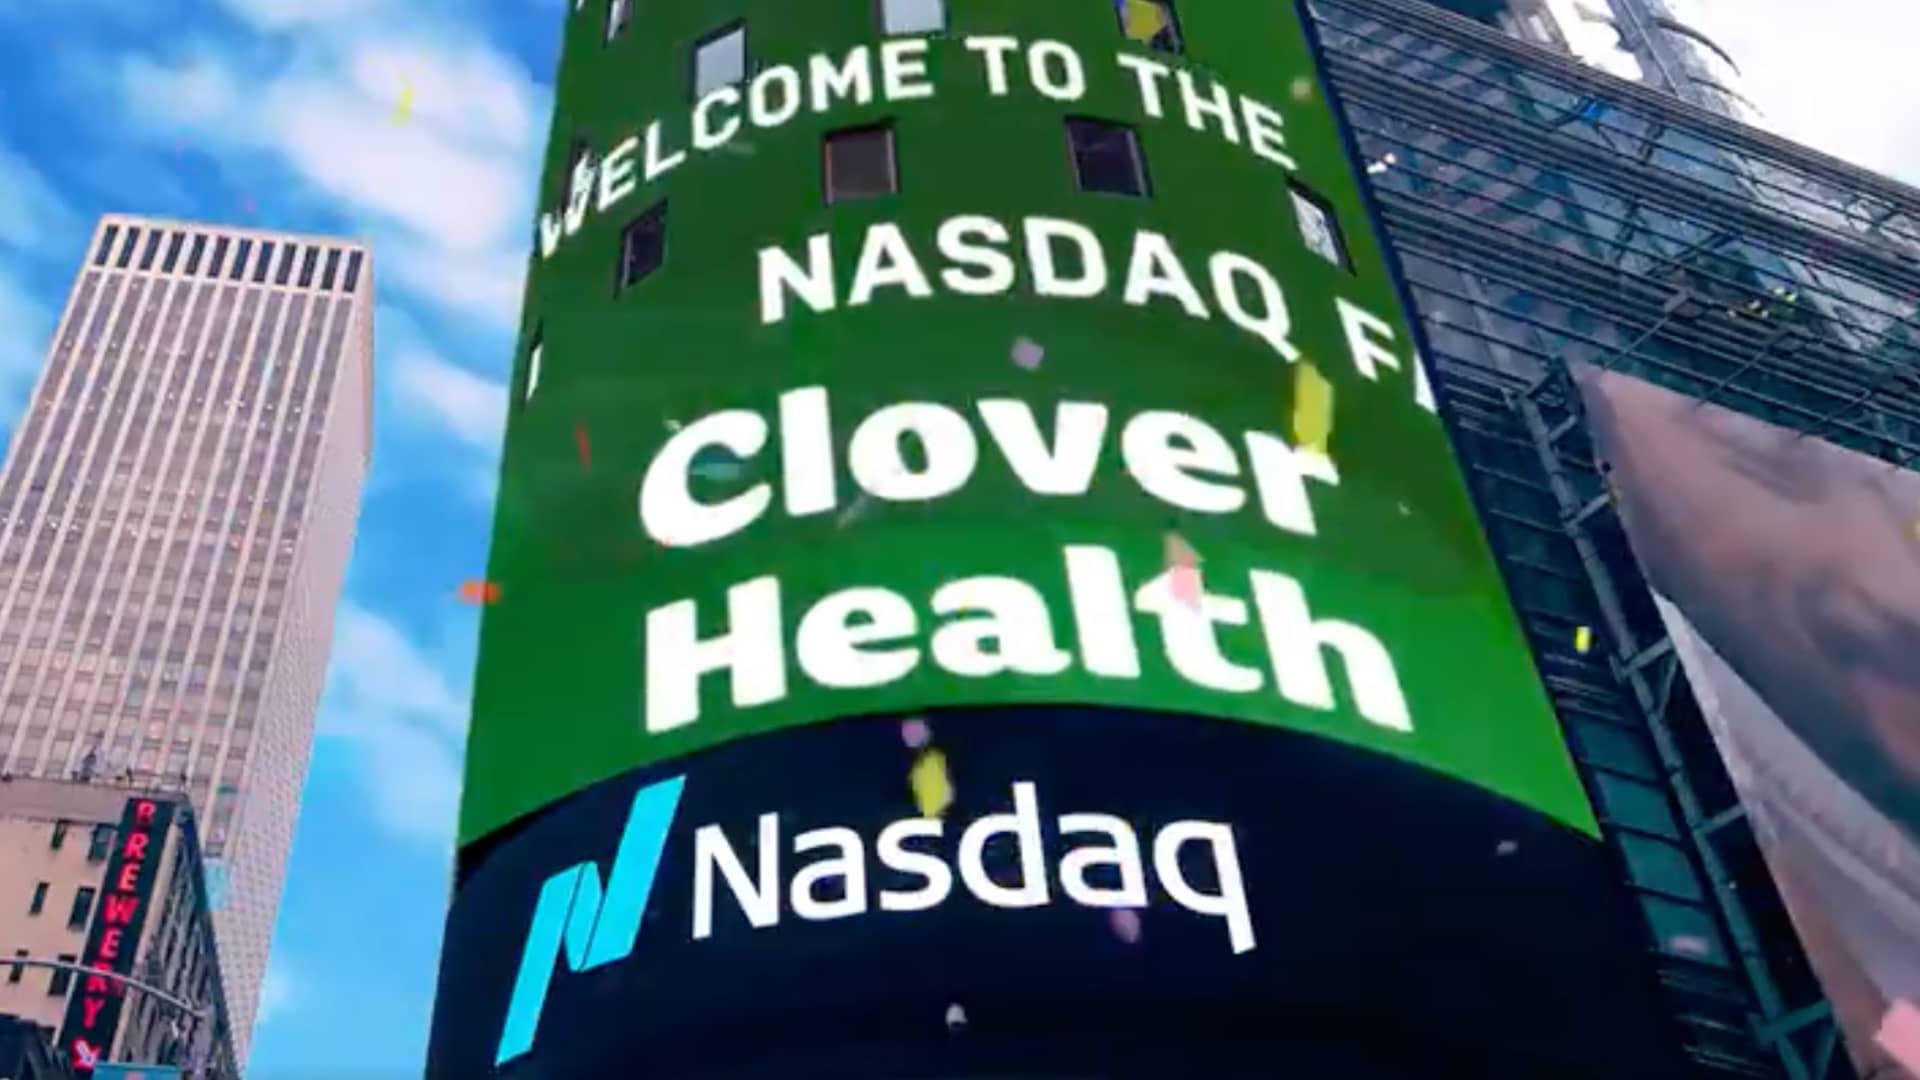 Clover Health featured at the Nasdaq